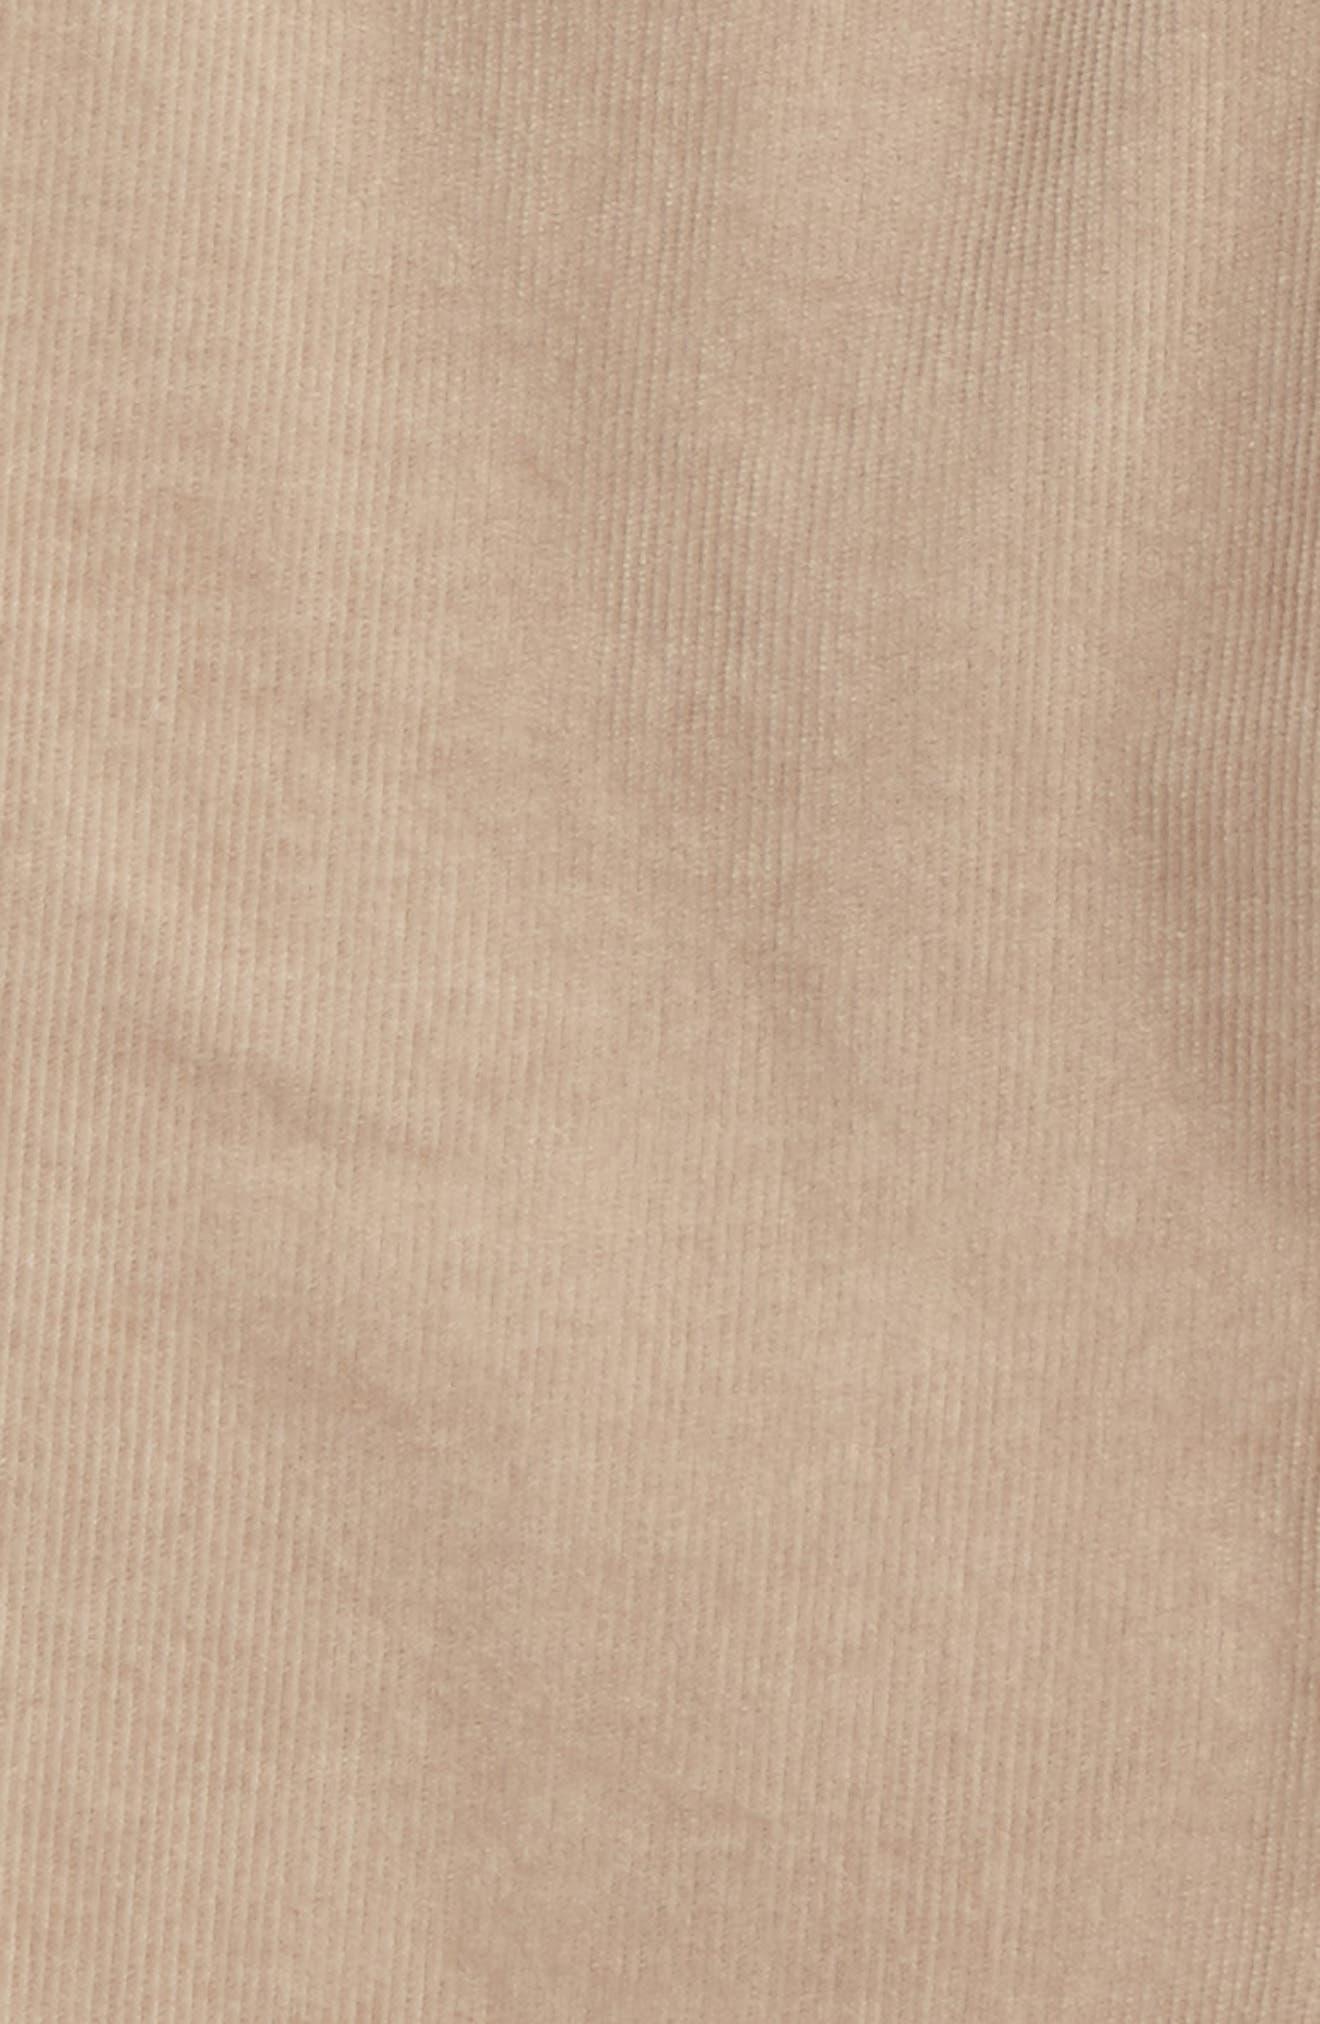 Breaker Corduroy Pants,                             Alternate thumbnail 2, color,                             250